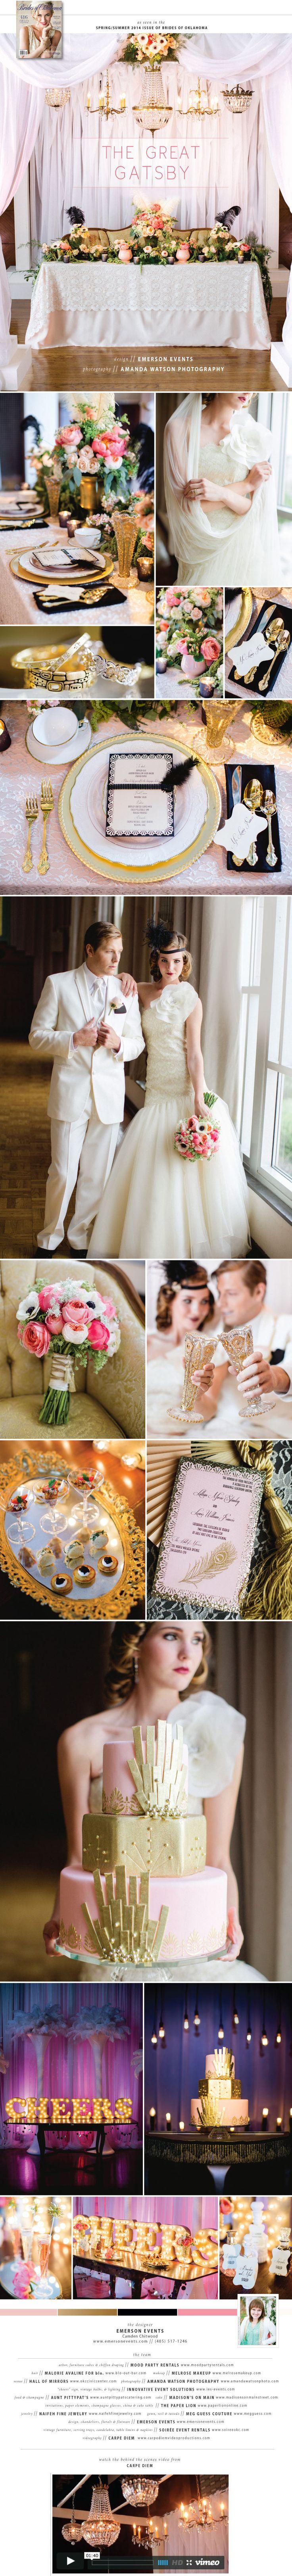 The Great Gatsby wedding inspiration